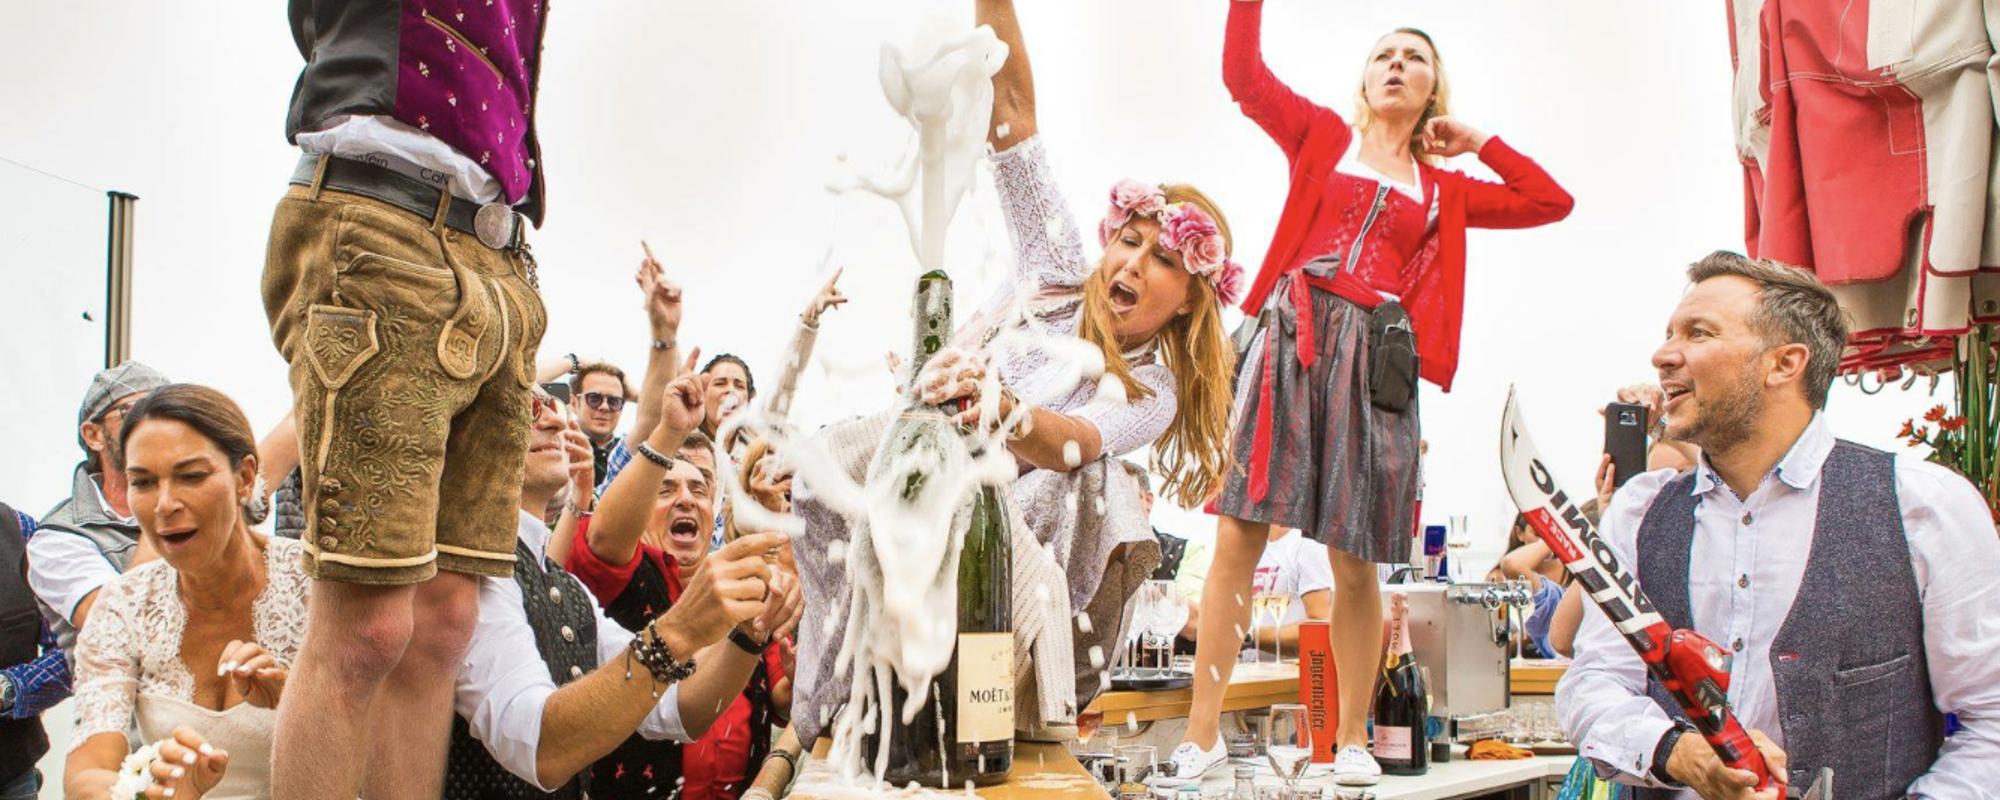 Feste feiern am Penken